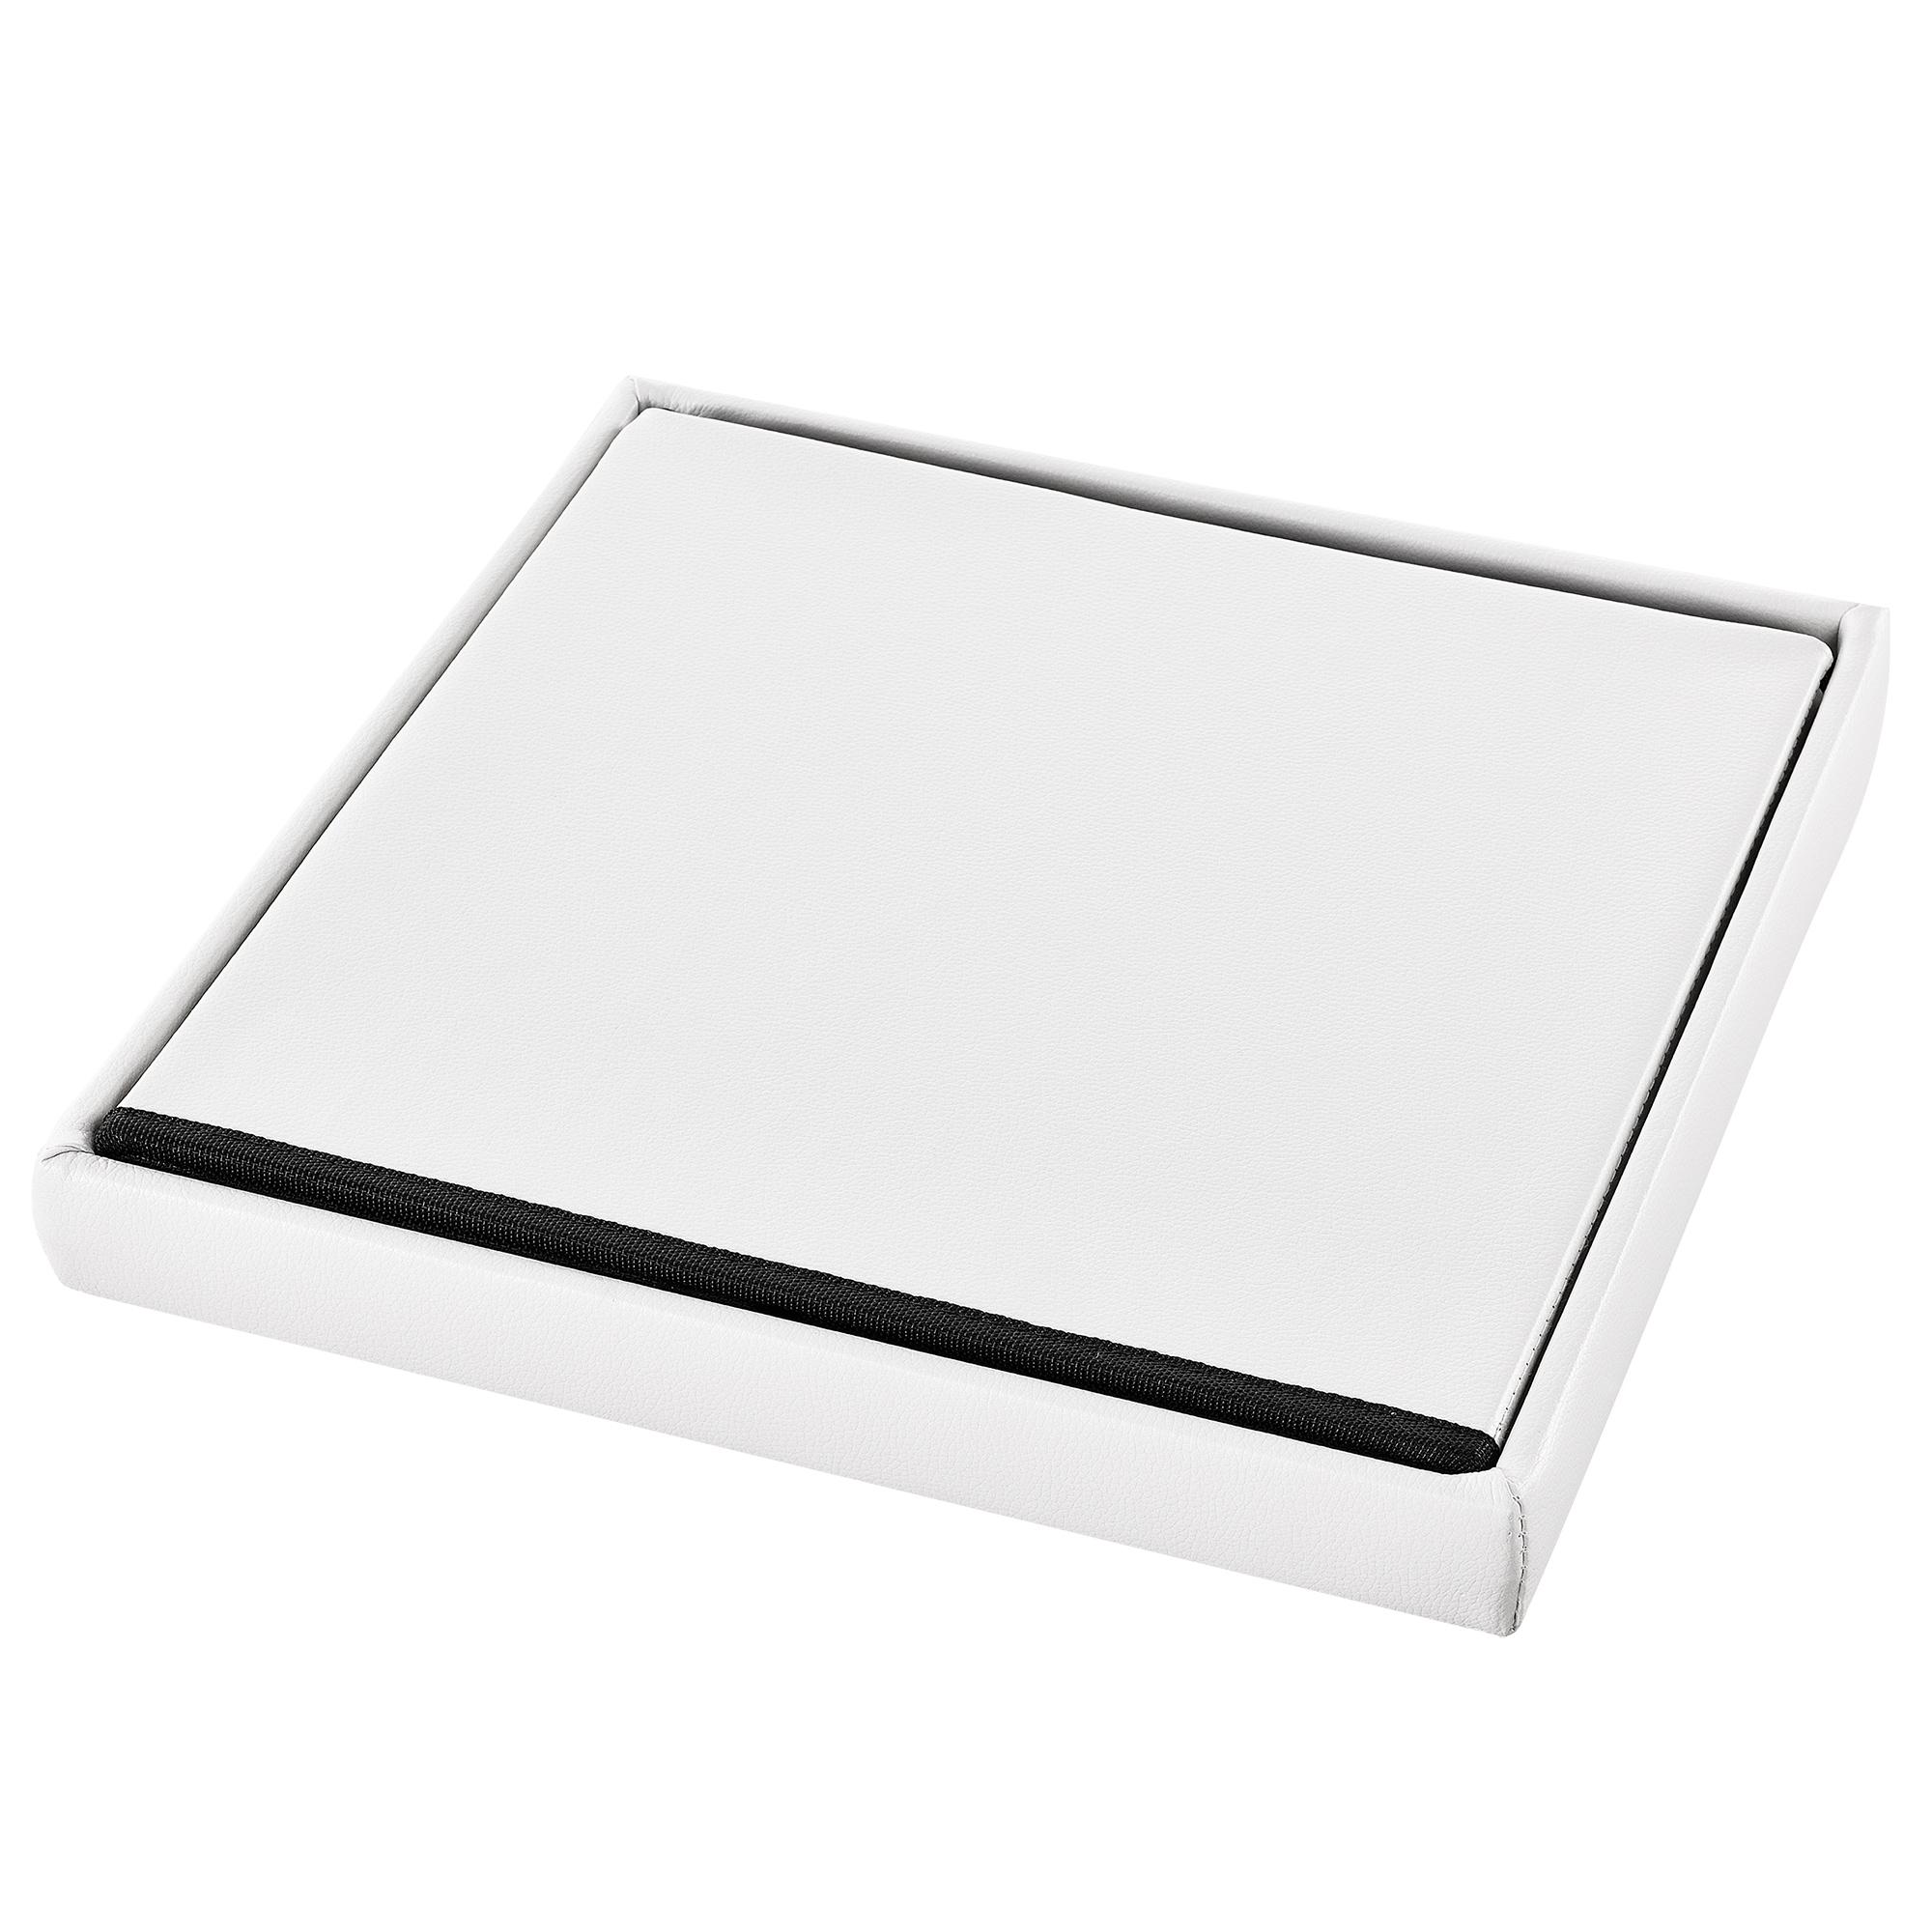 sitzhocker wei 38x38x38cm sitzw rfel. Black Bedroom Furniture Sets. Home Design Ideas